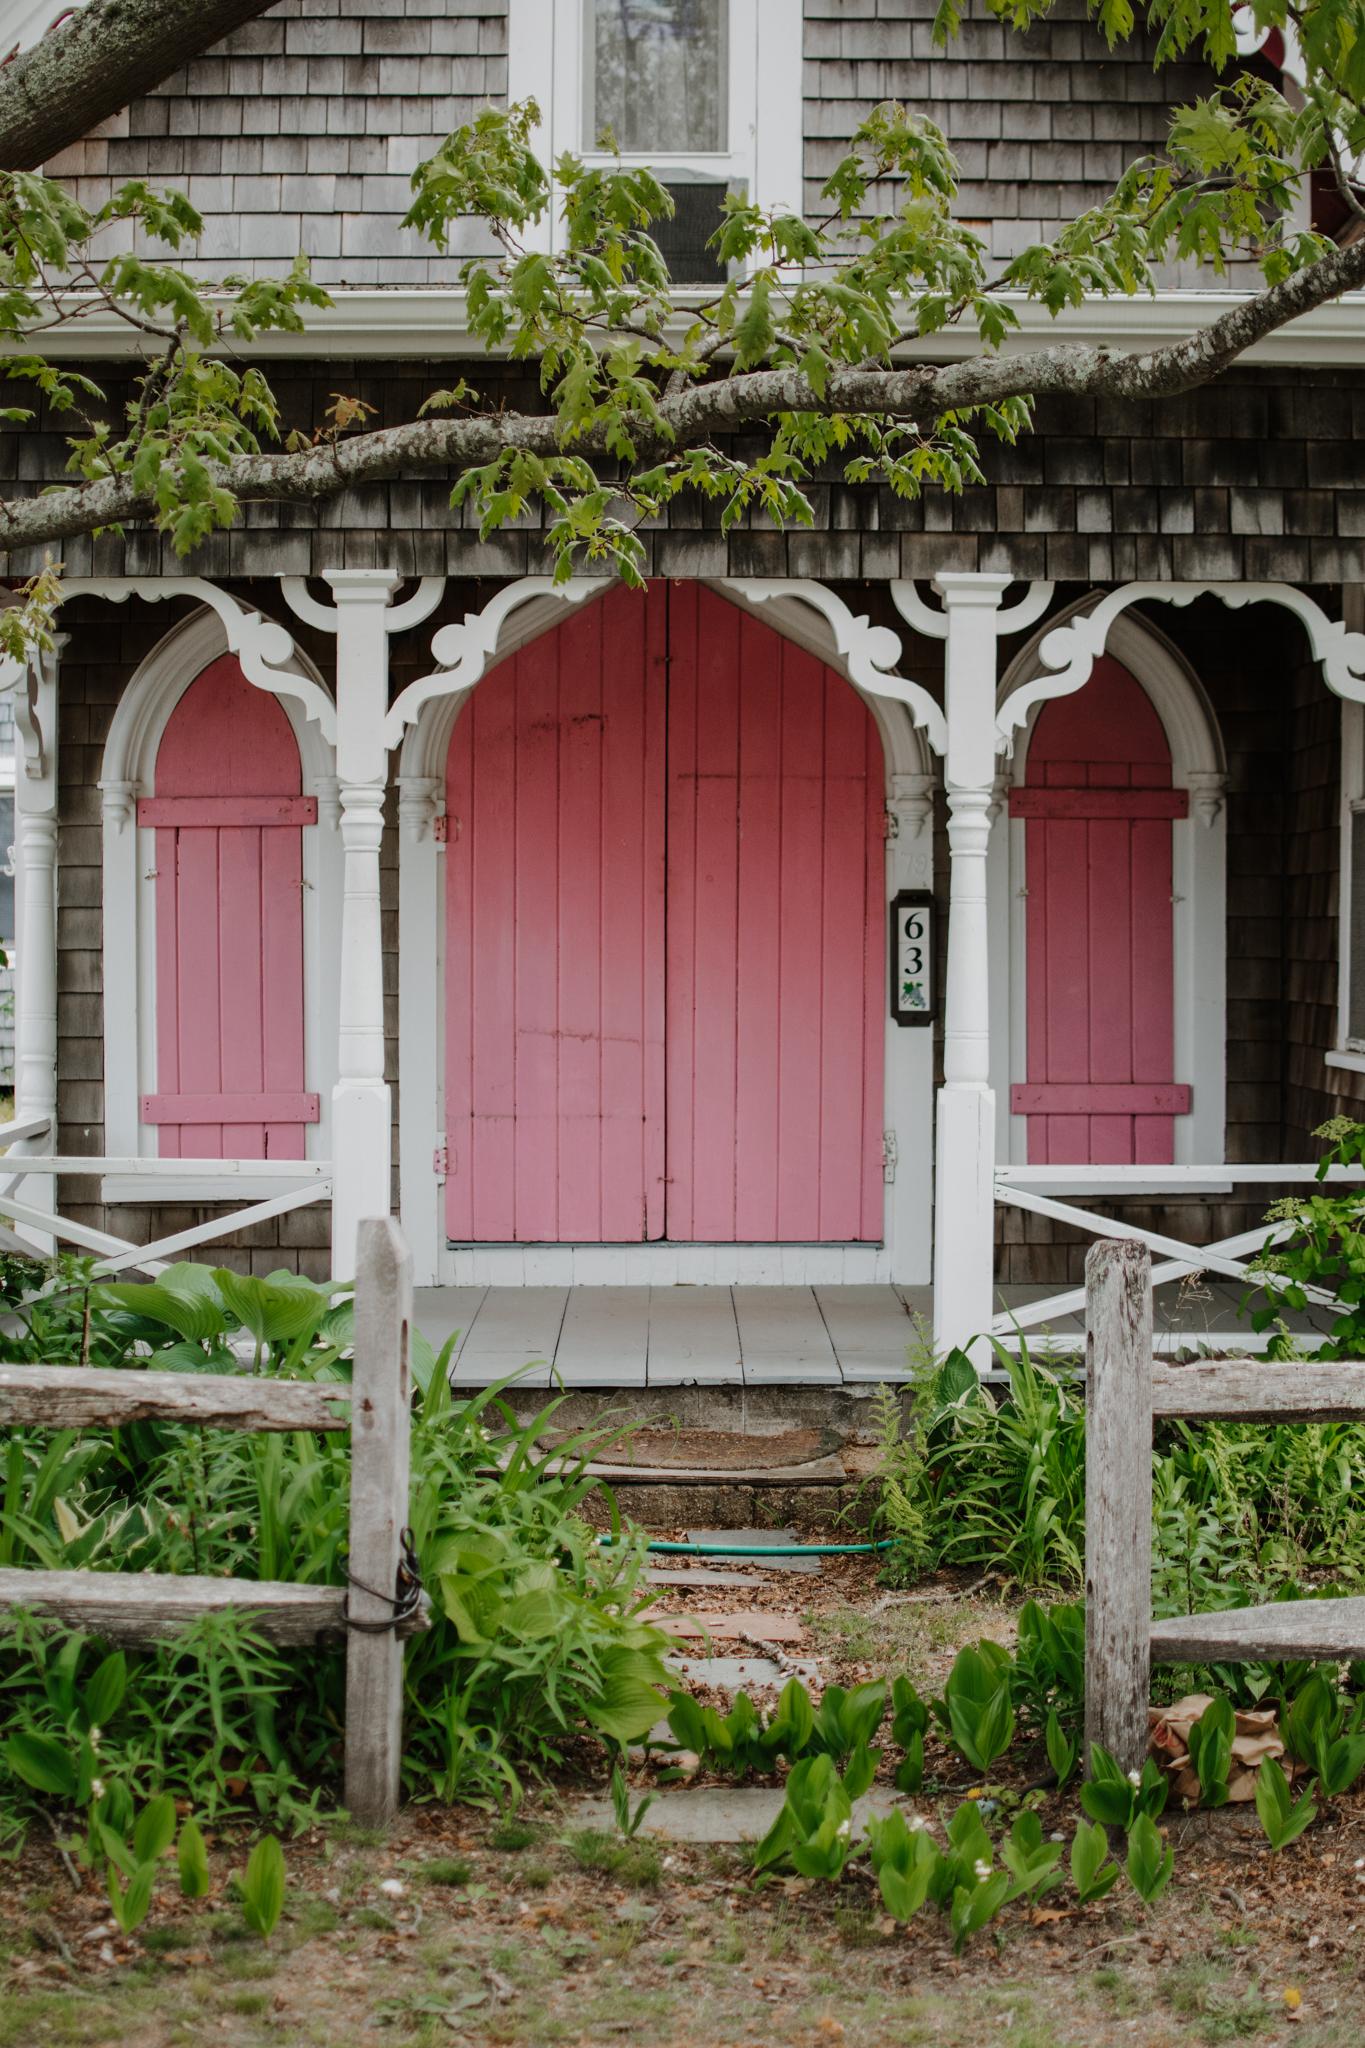 spring weekend in martha's vineyard - martha's vineyard travel guide - oak bluffs gingerbread cottages